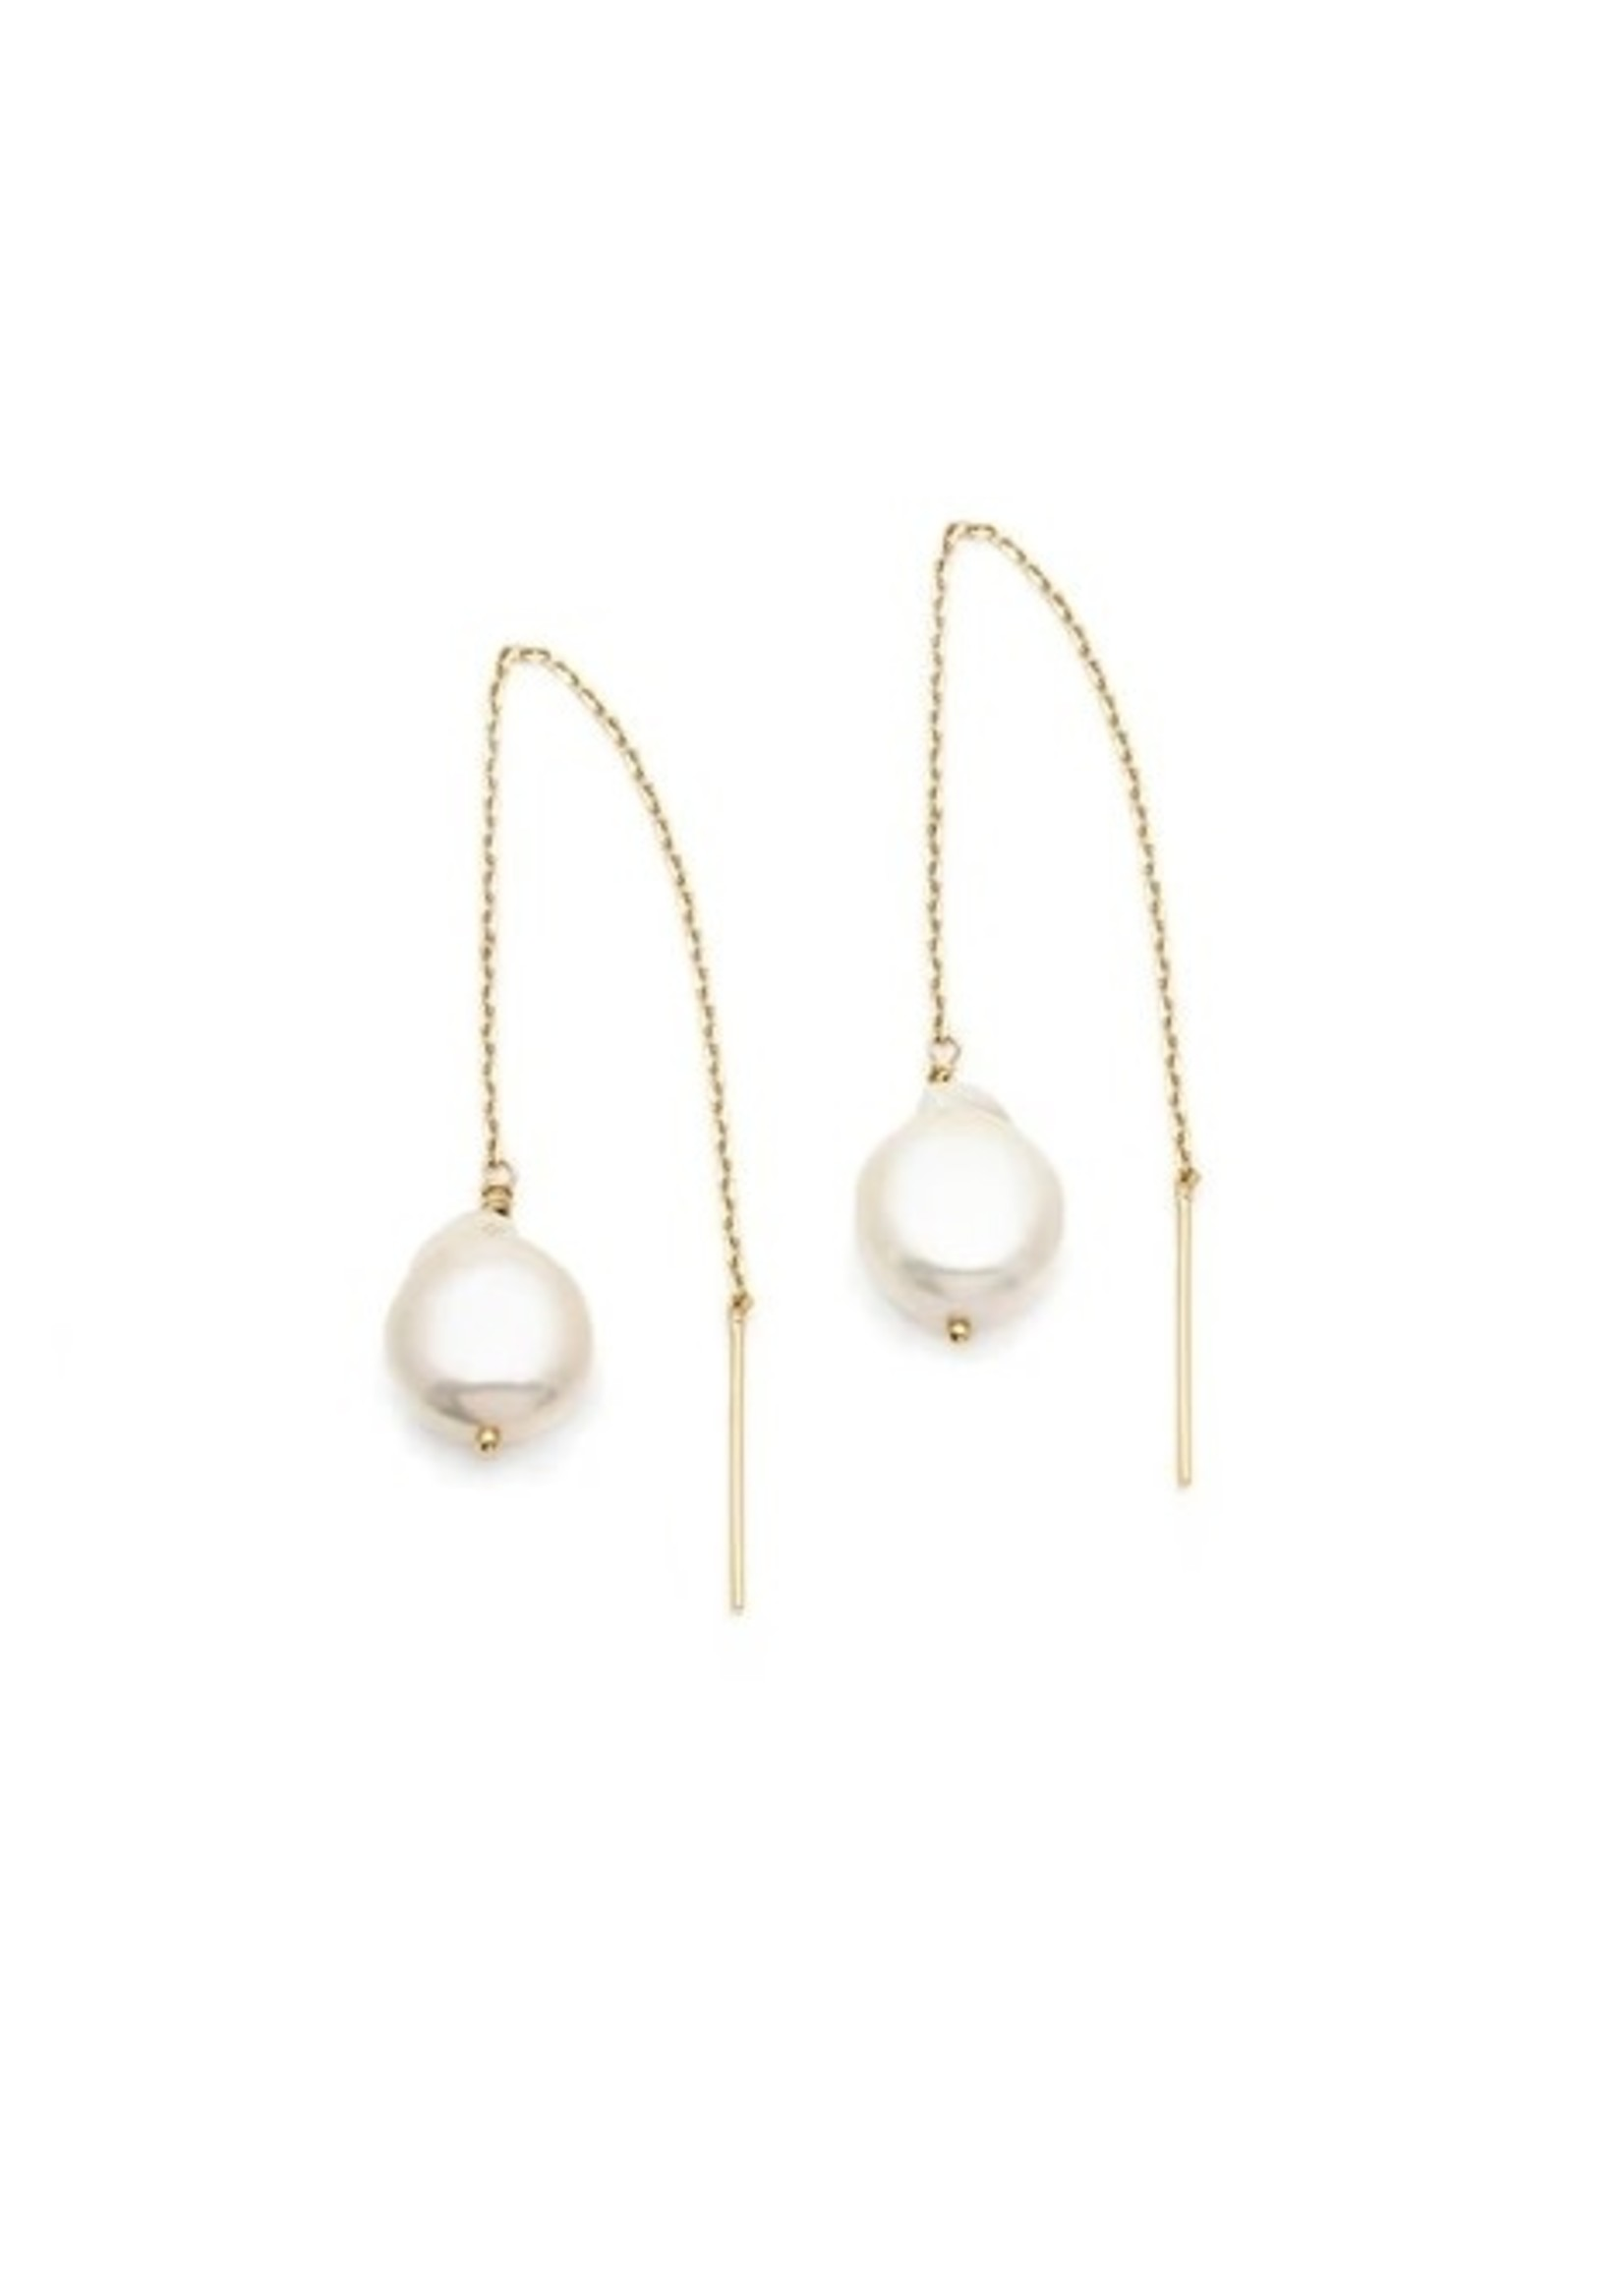 LEAH ALEXANDRA Threaders with Pearls